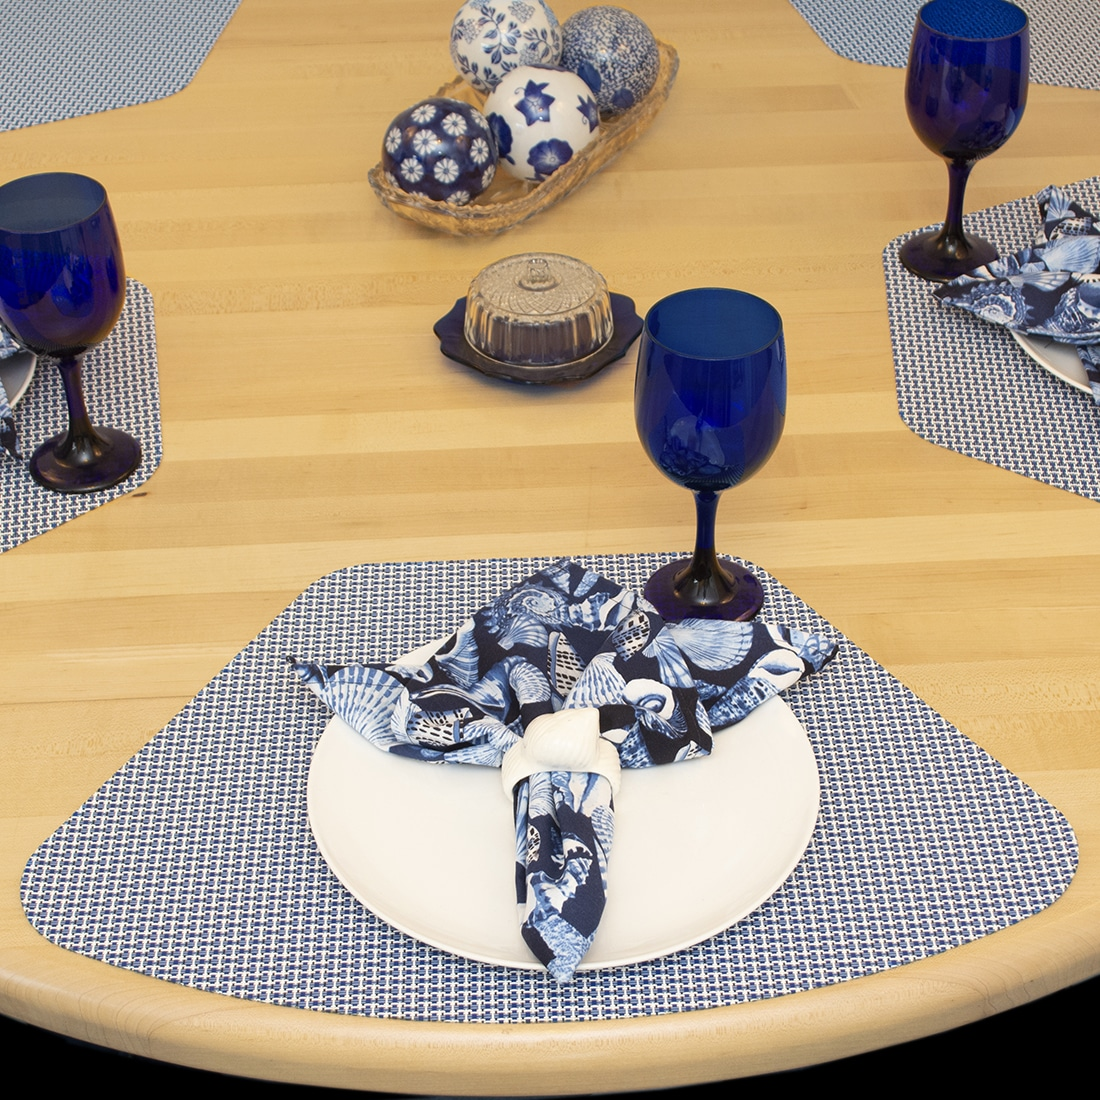 Sweet Pea Linens - Blue Seashell Rolled Hem Cloth Napkin (SKU#: R-1010-F18) - Table Setting